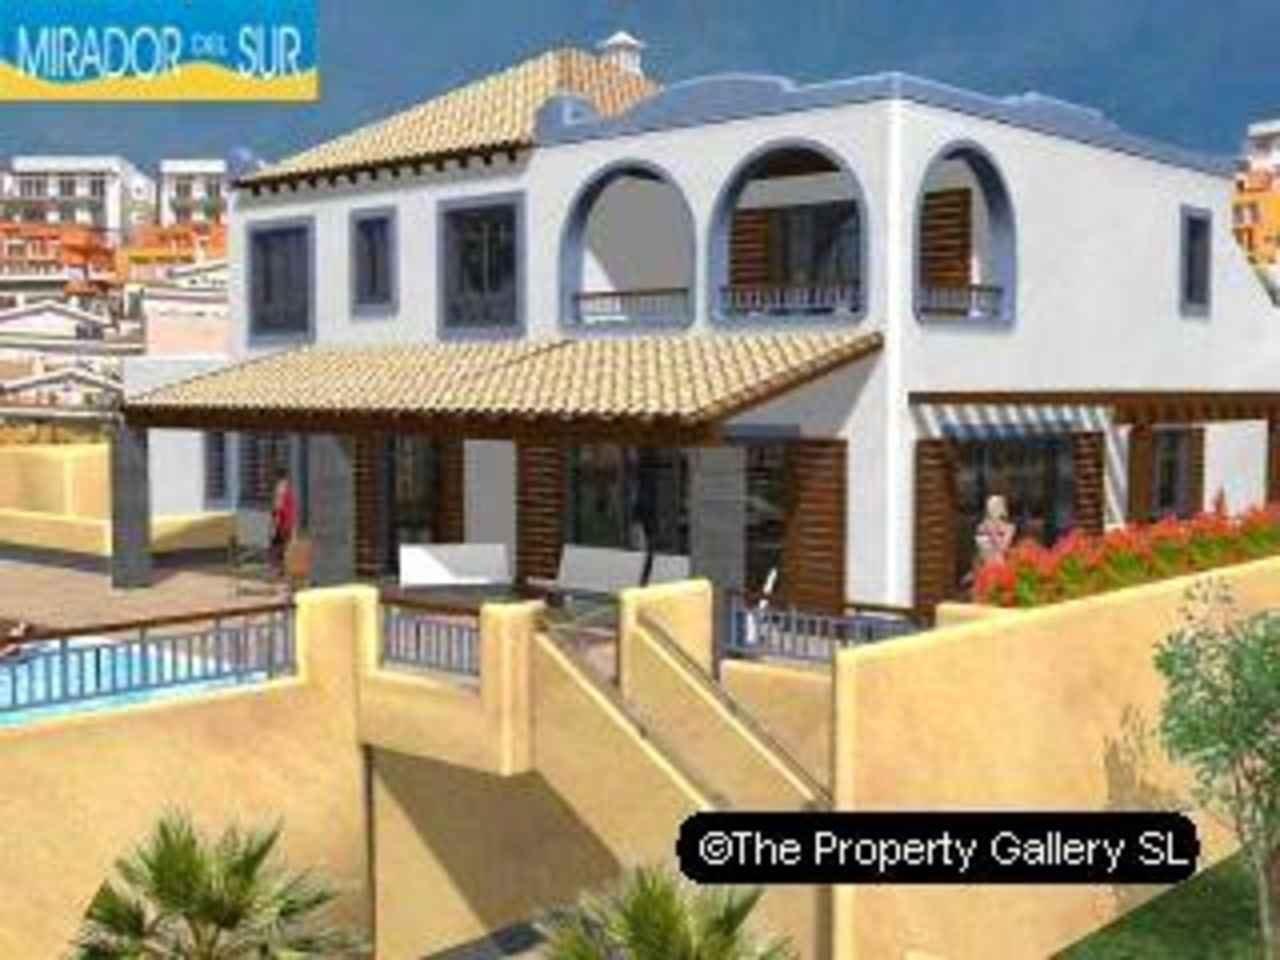 Villa in Costa Adeje, Canary Islands, Spain 1